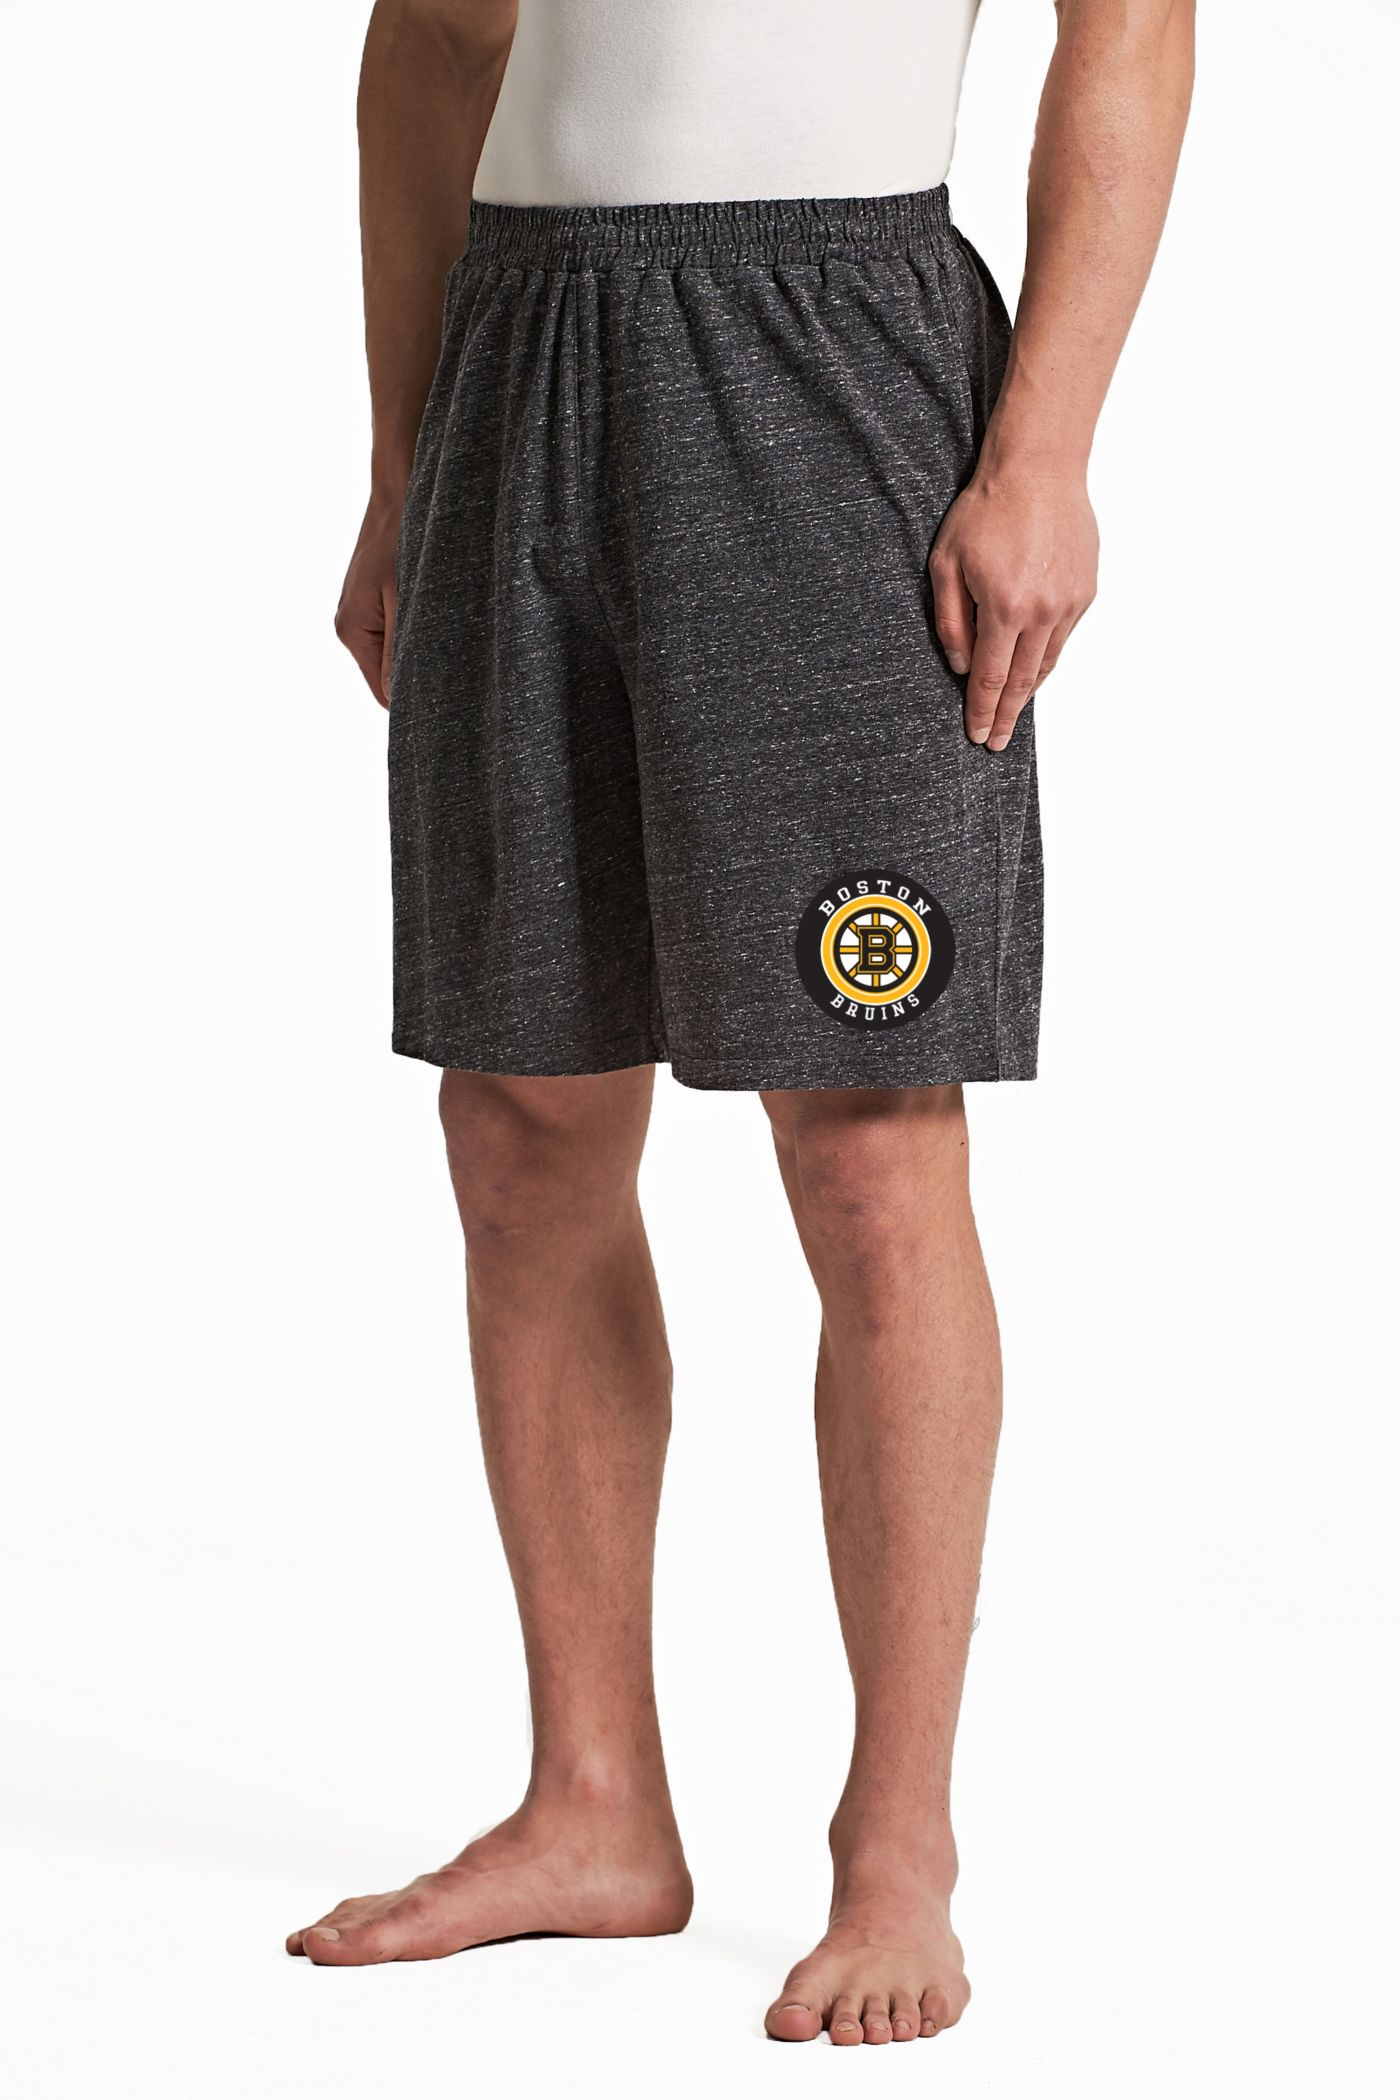 Concepts Sport Men's Boston Bruins Pitch Grey Shorts